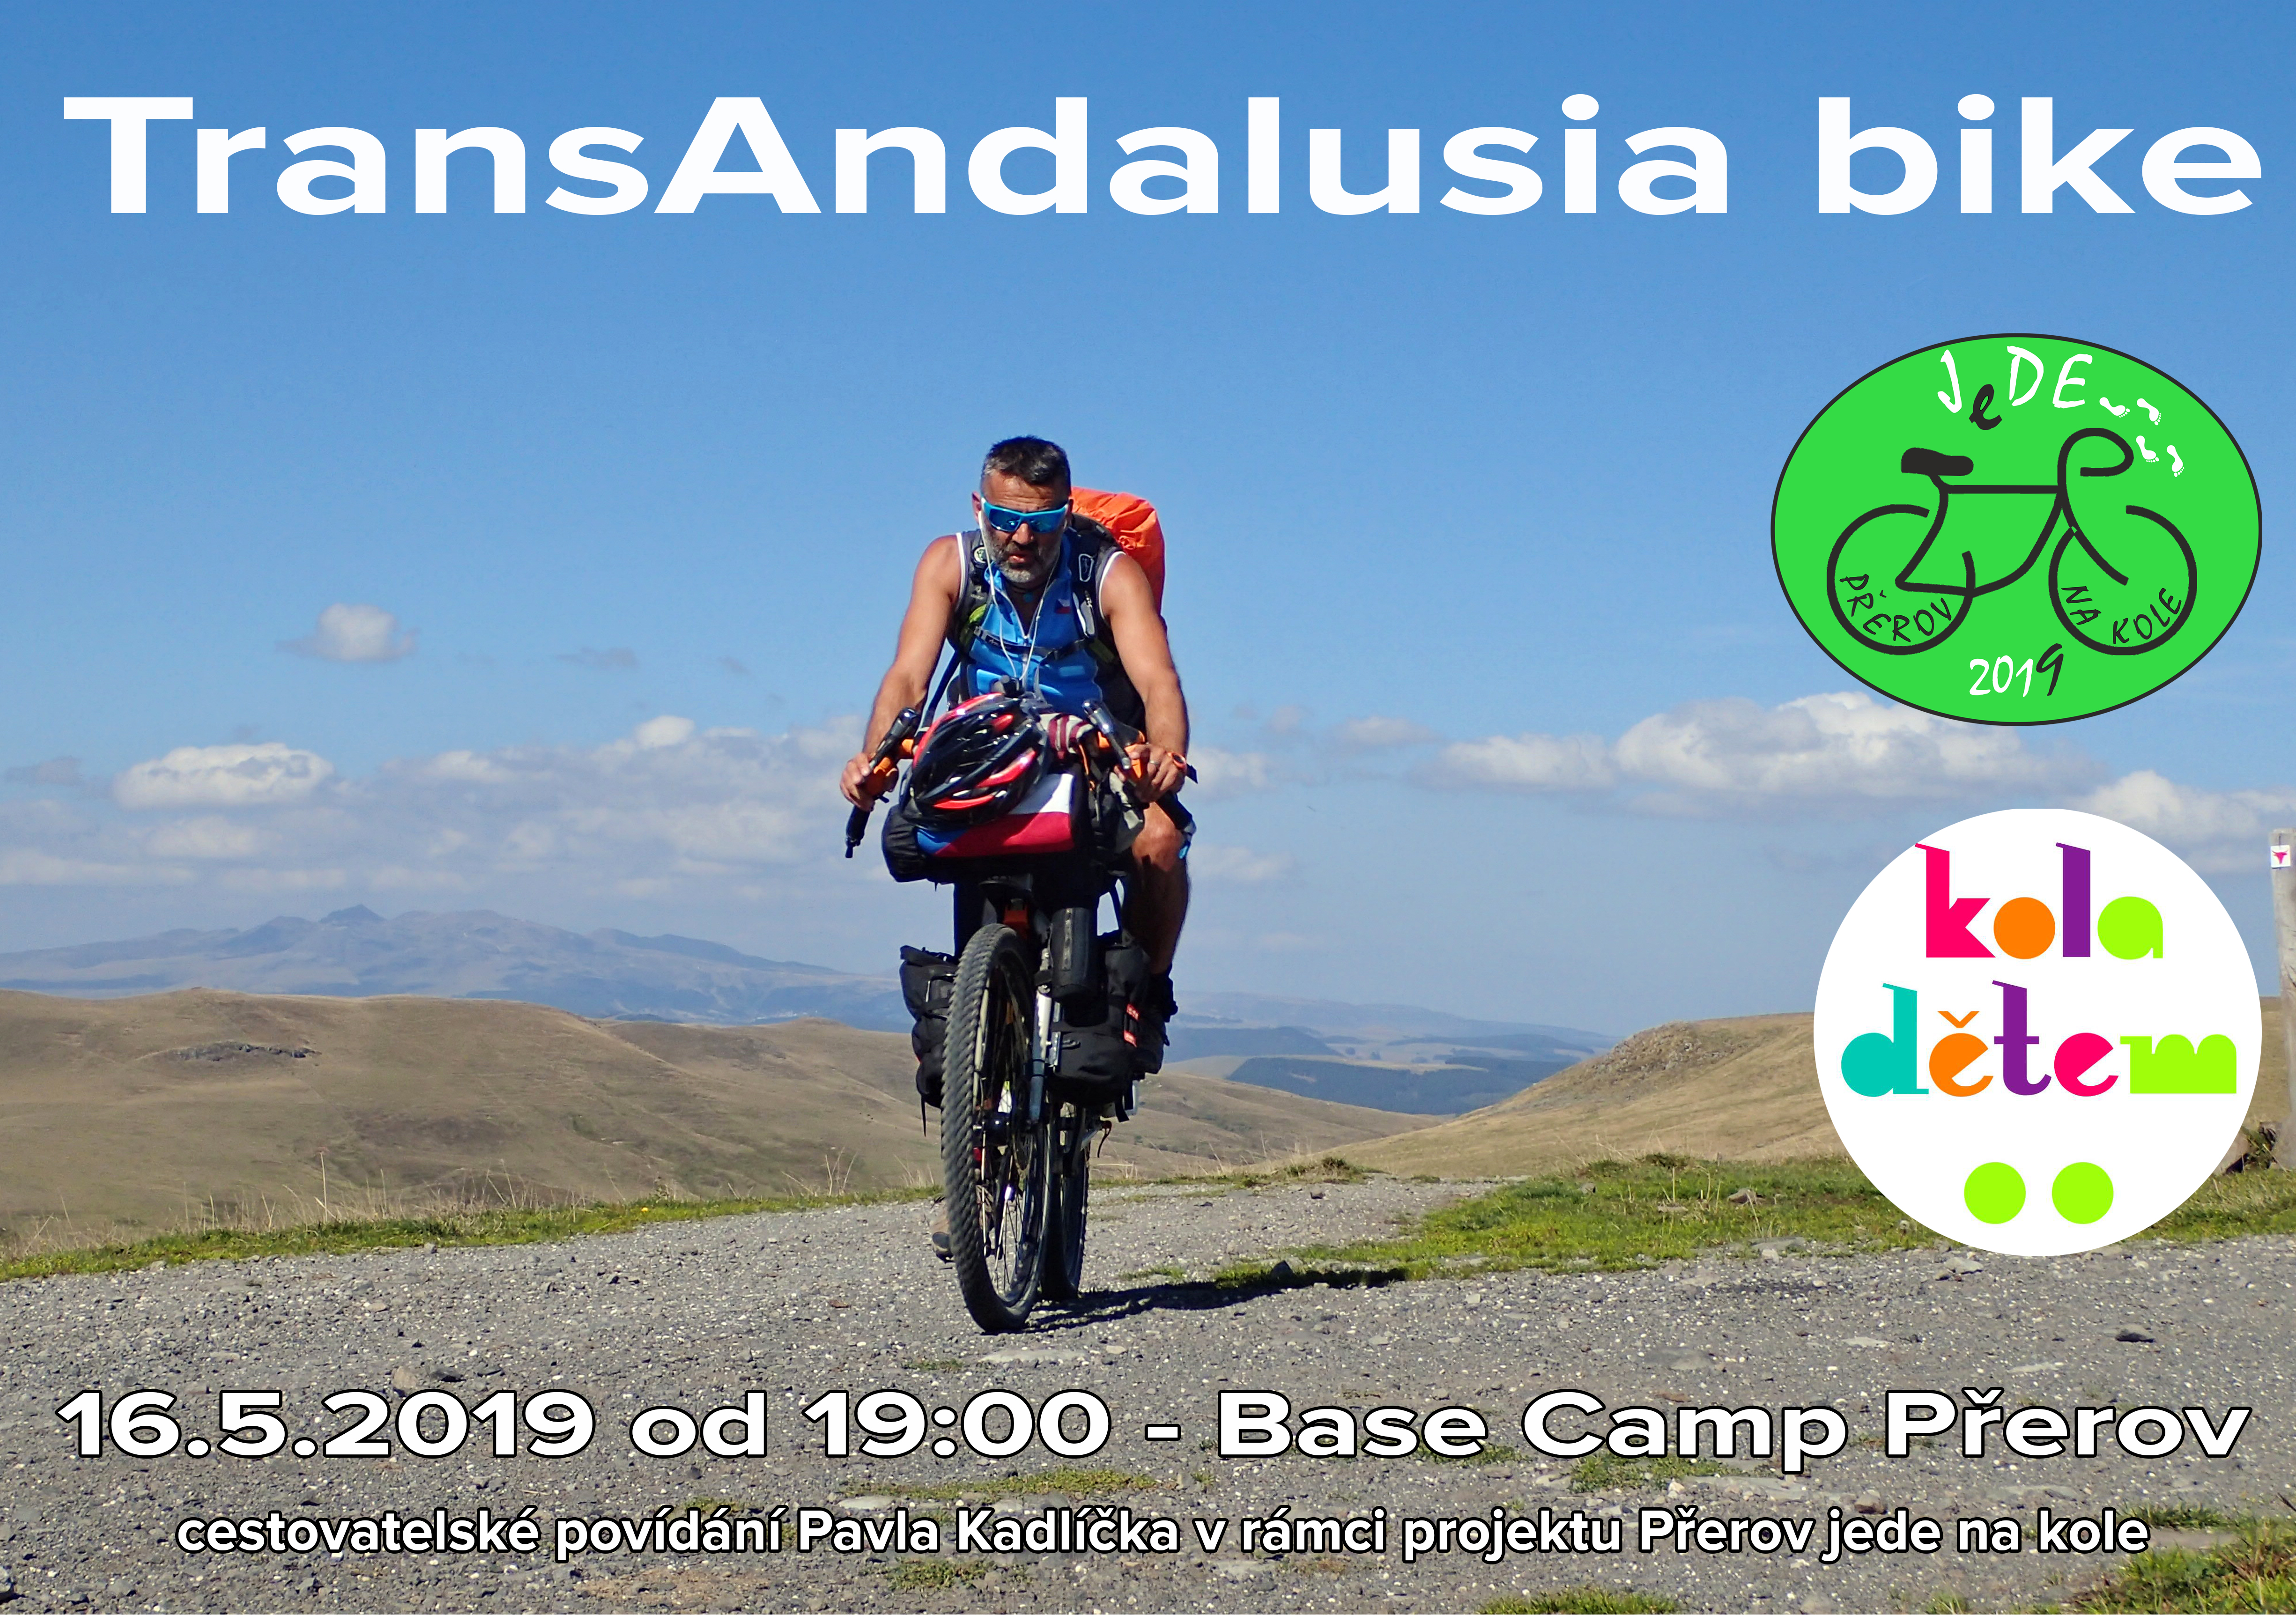 plakát beseda Base Camp3